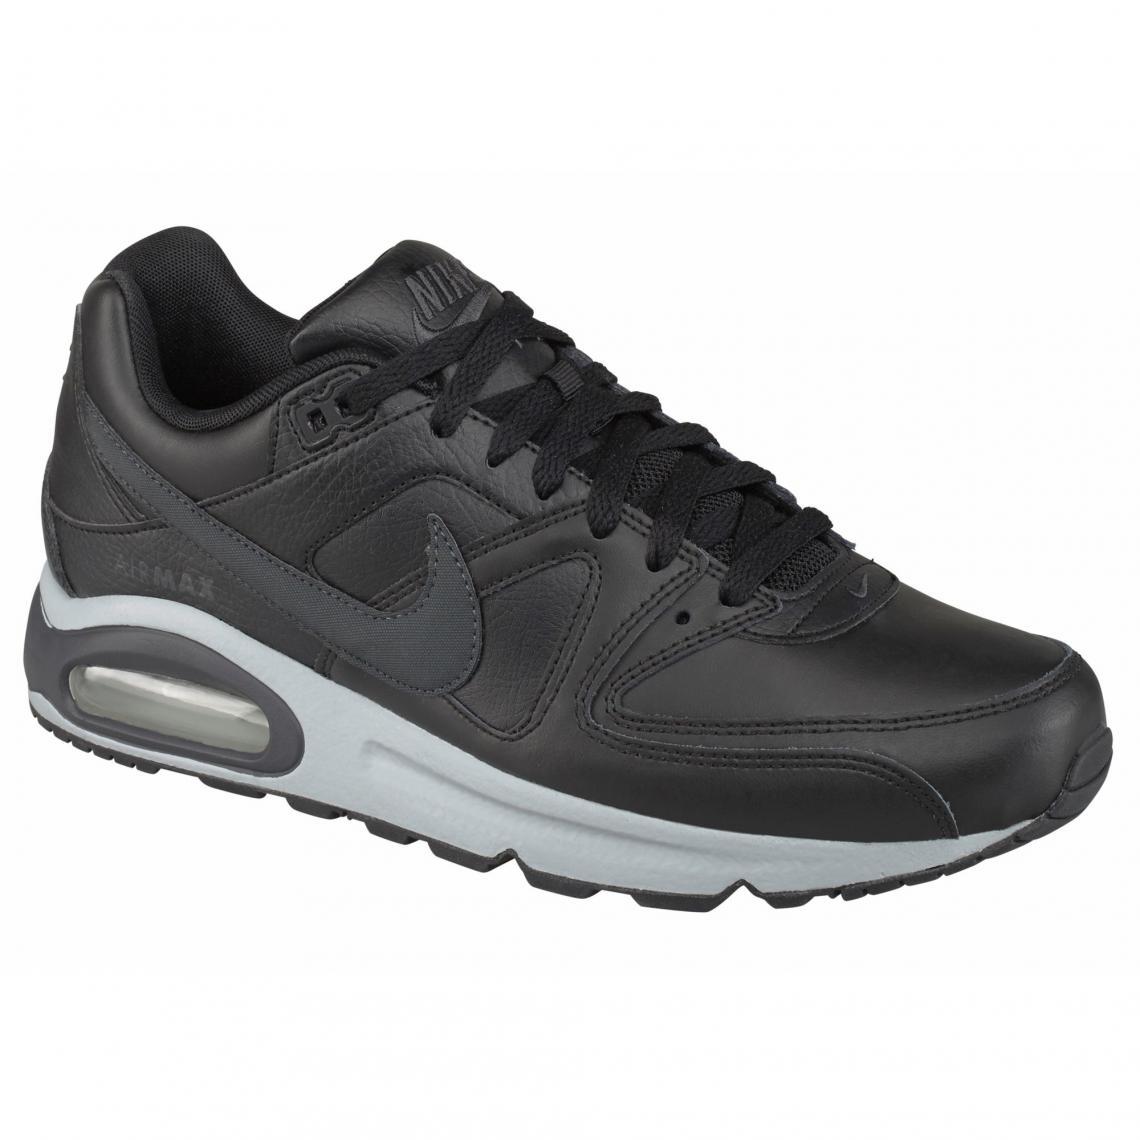 la meilleure attitude b8bcd 89266 Nike Air Max Command LTH chaussures running sport homme | 3 ...